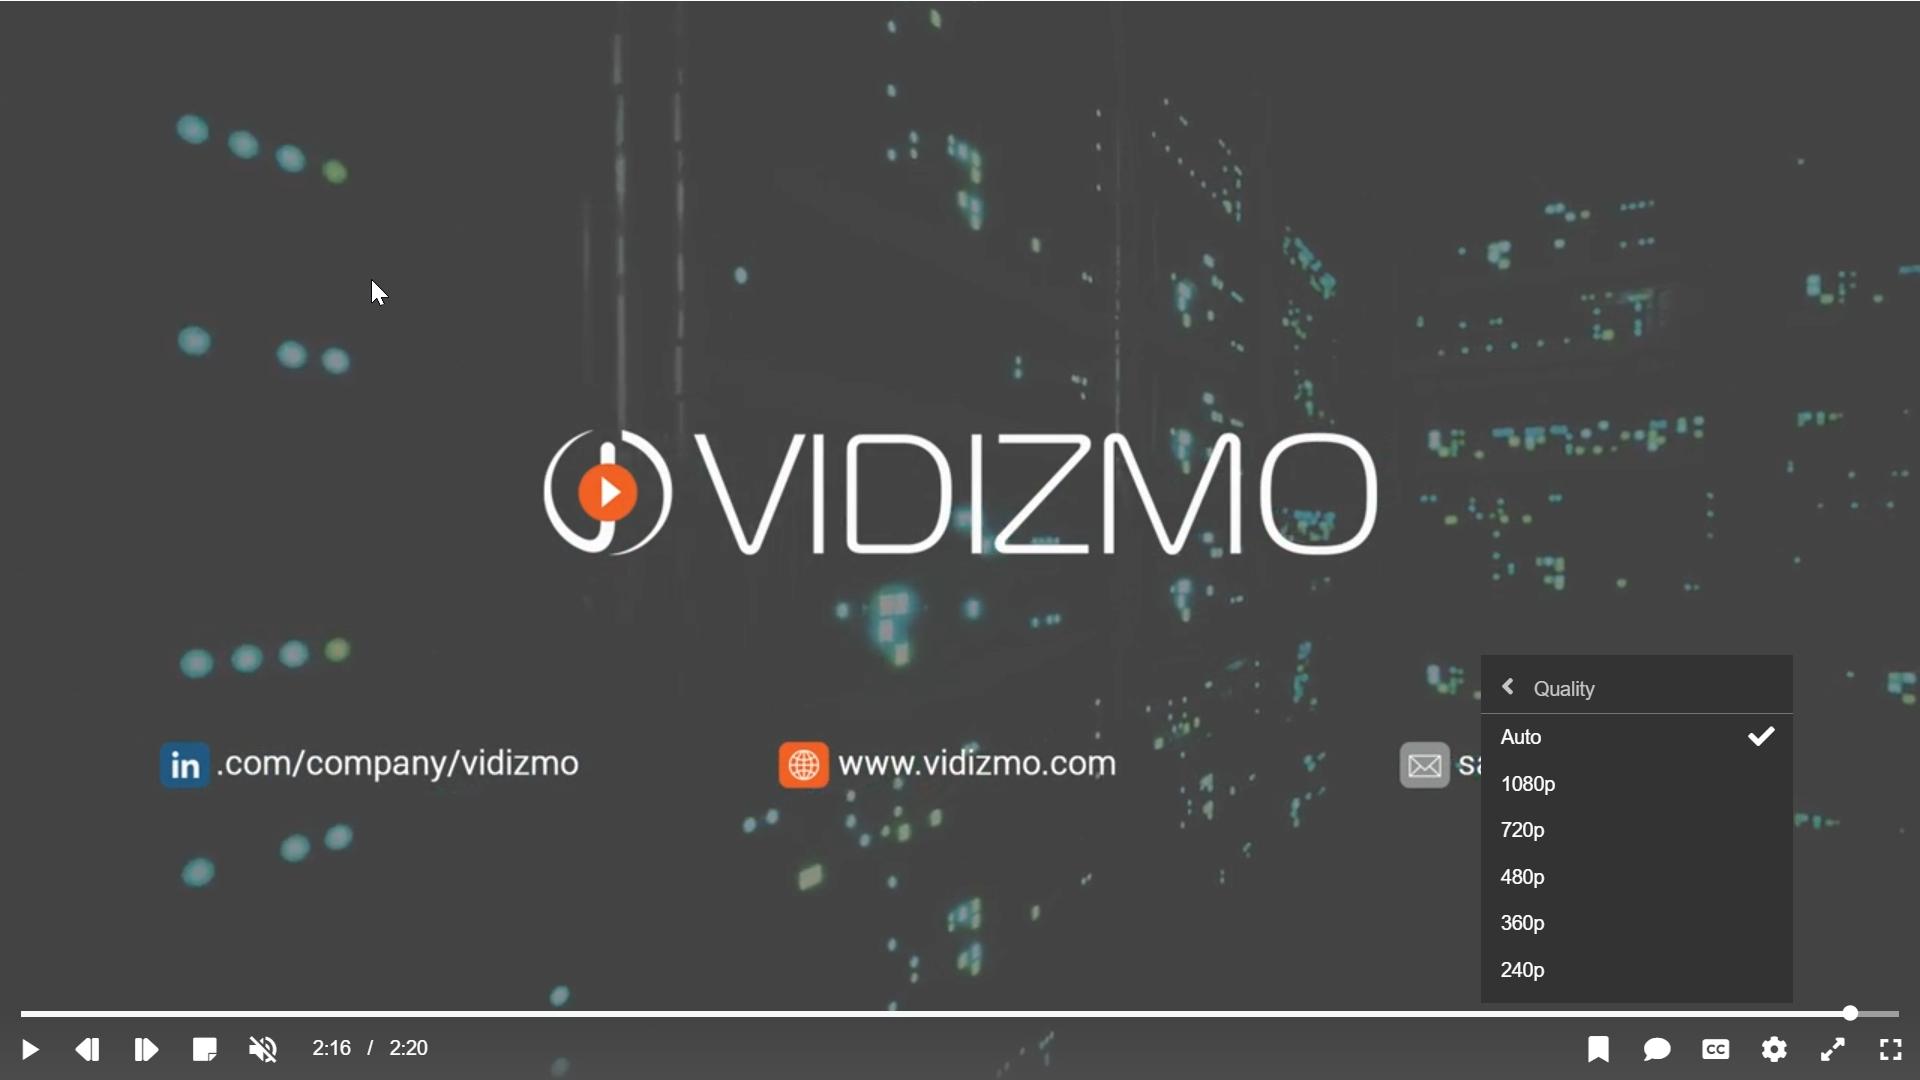 VIDIZMO - Adaptive Bitrate Streaming